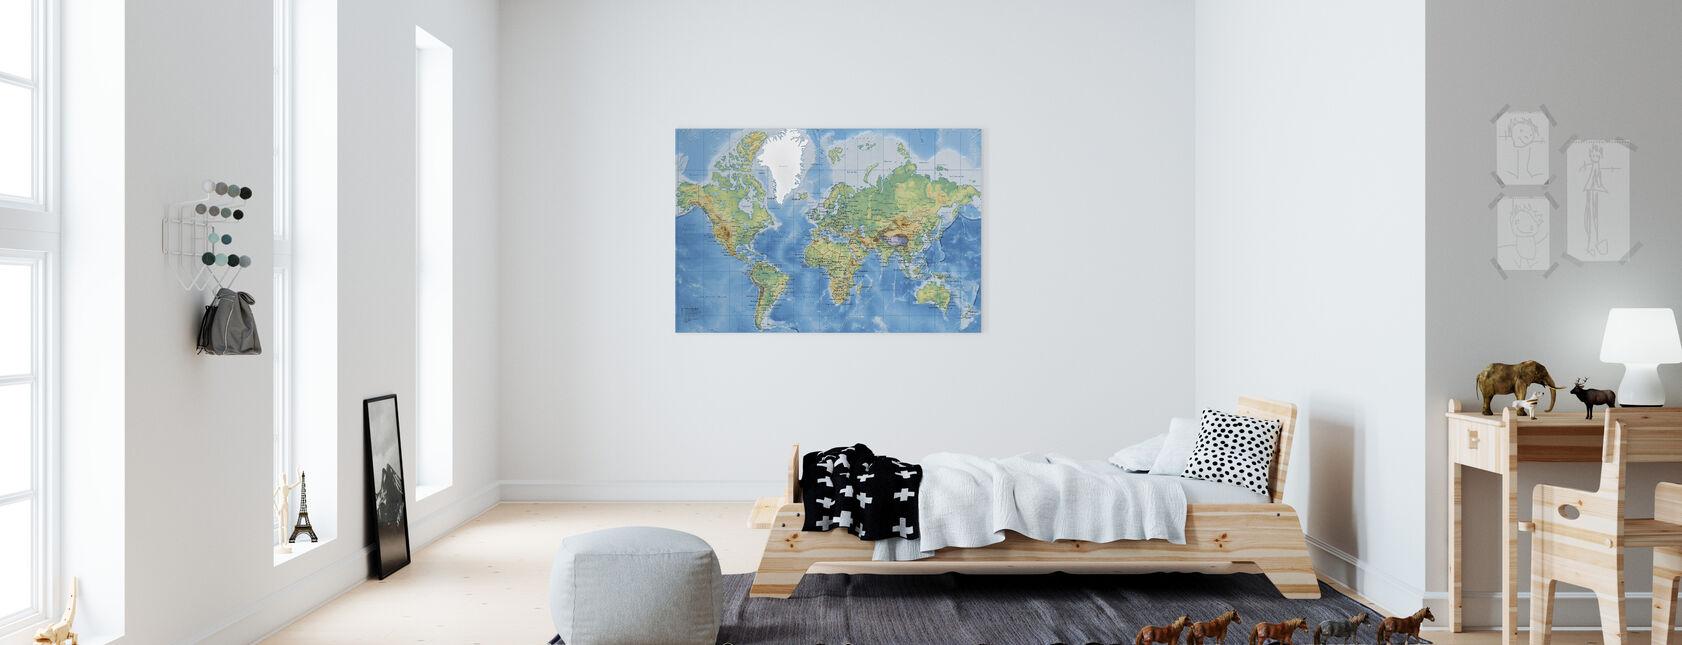 Weltkarte detailliert - Leinwandbild - Kinderzimmer